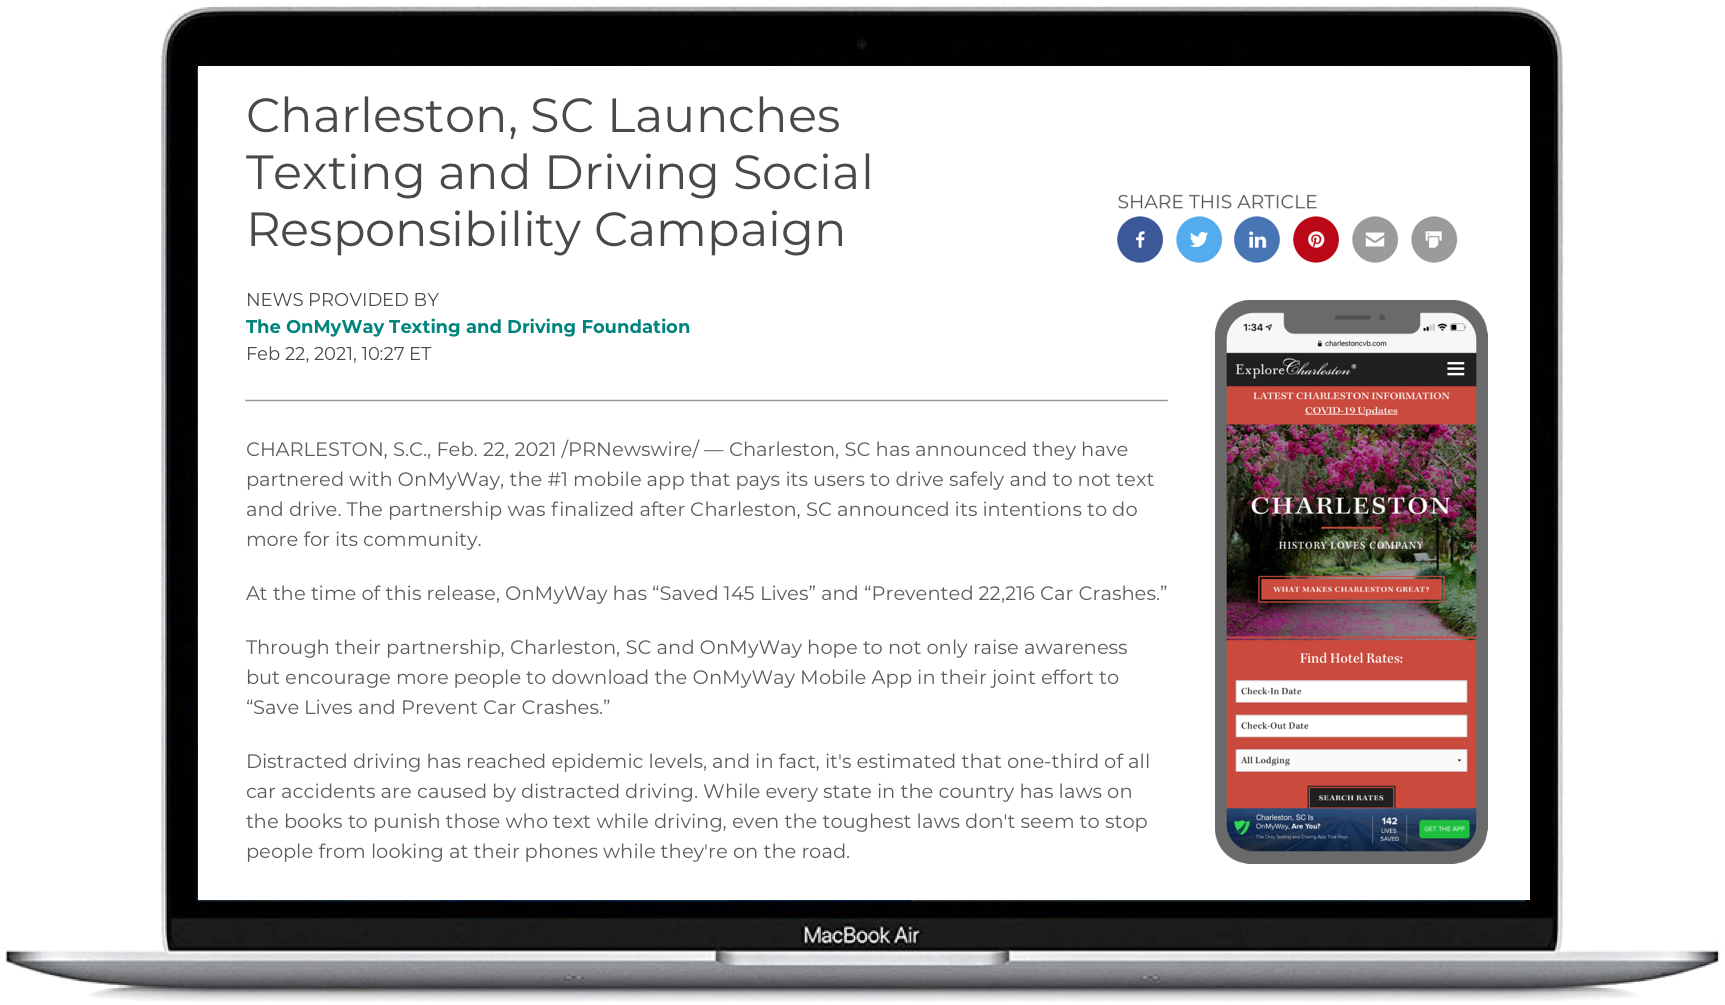 Charleston SC Press Release